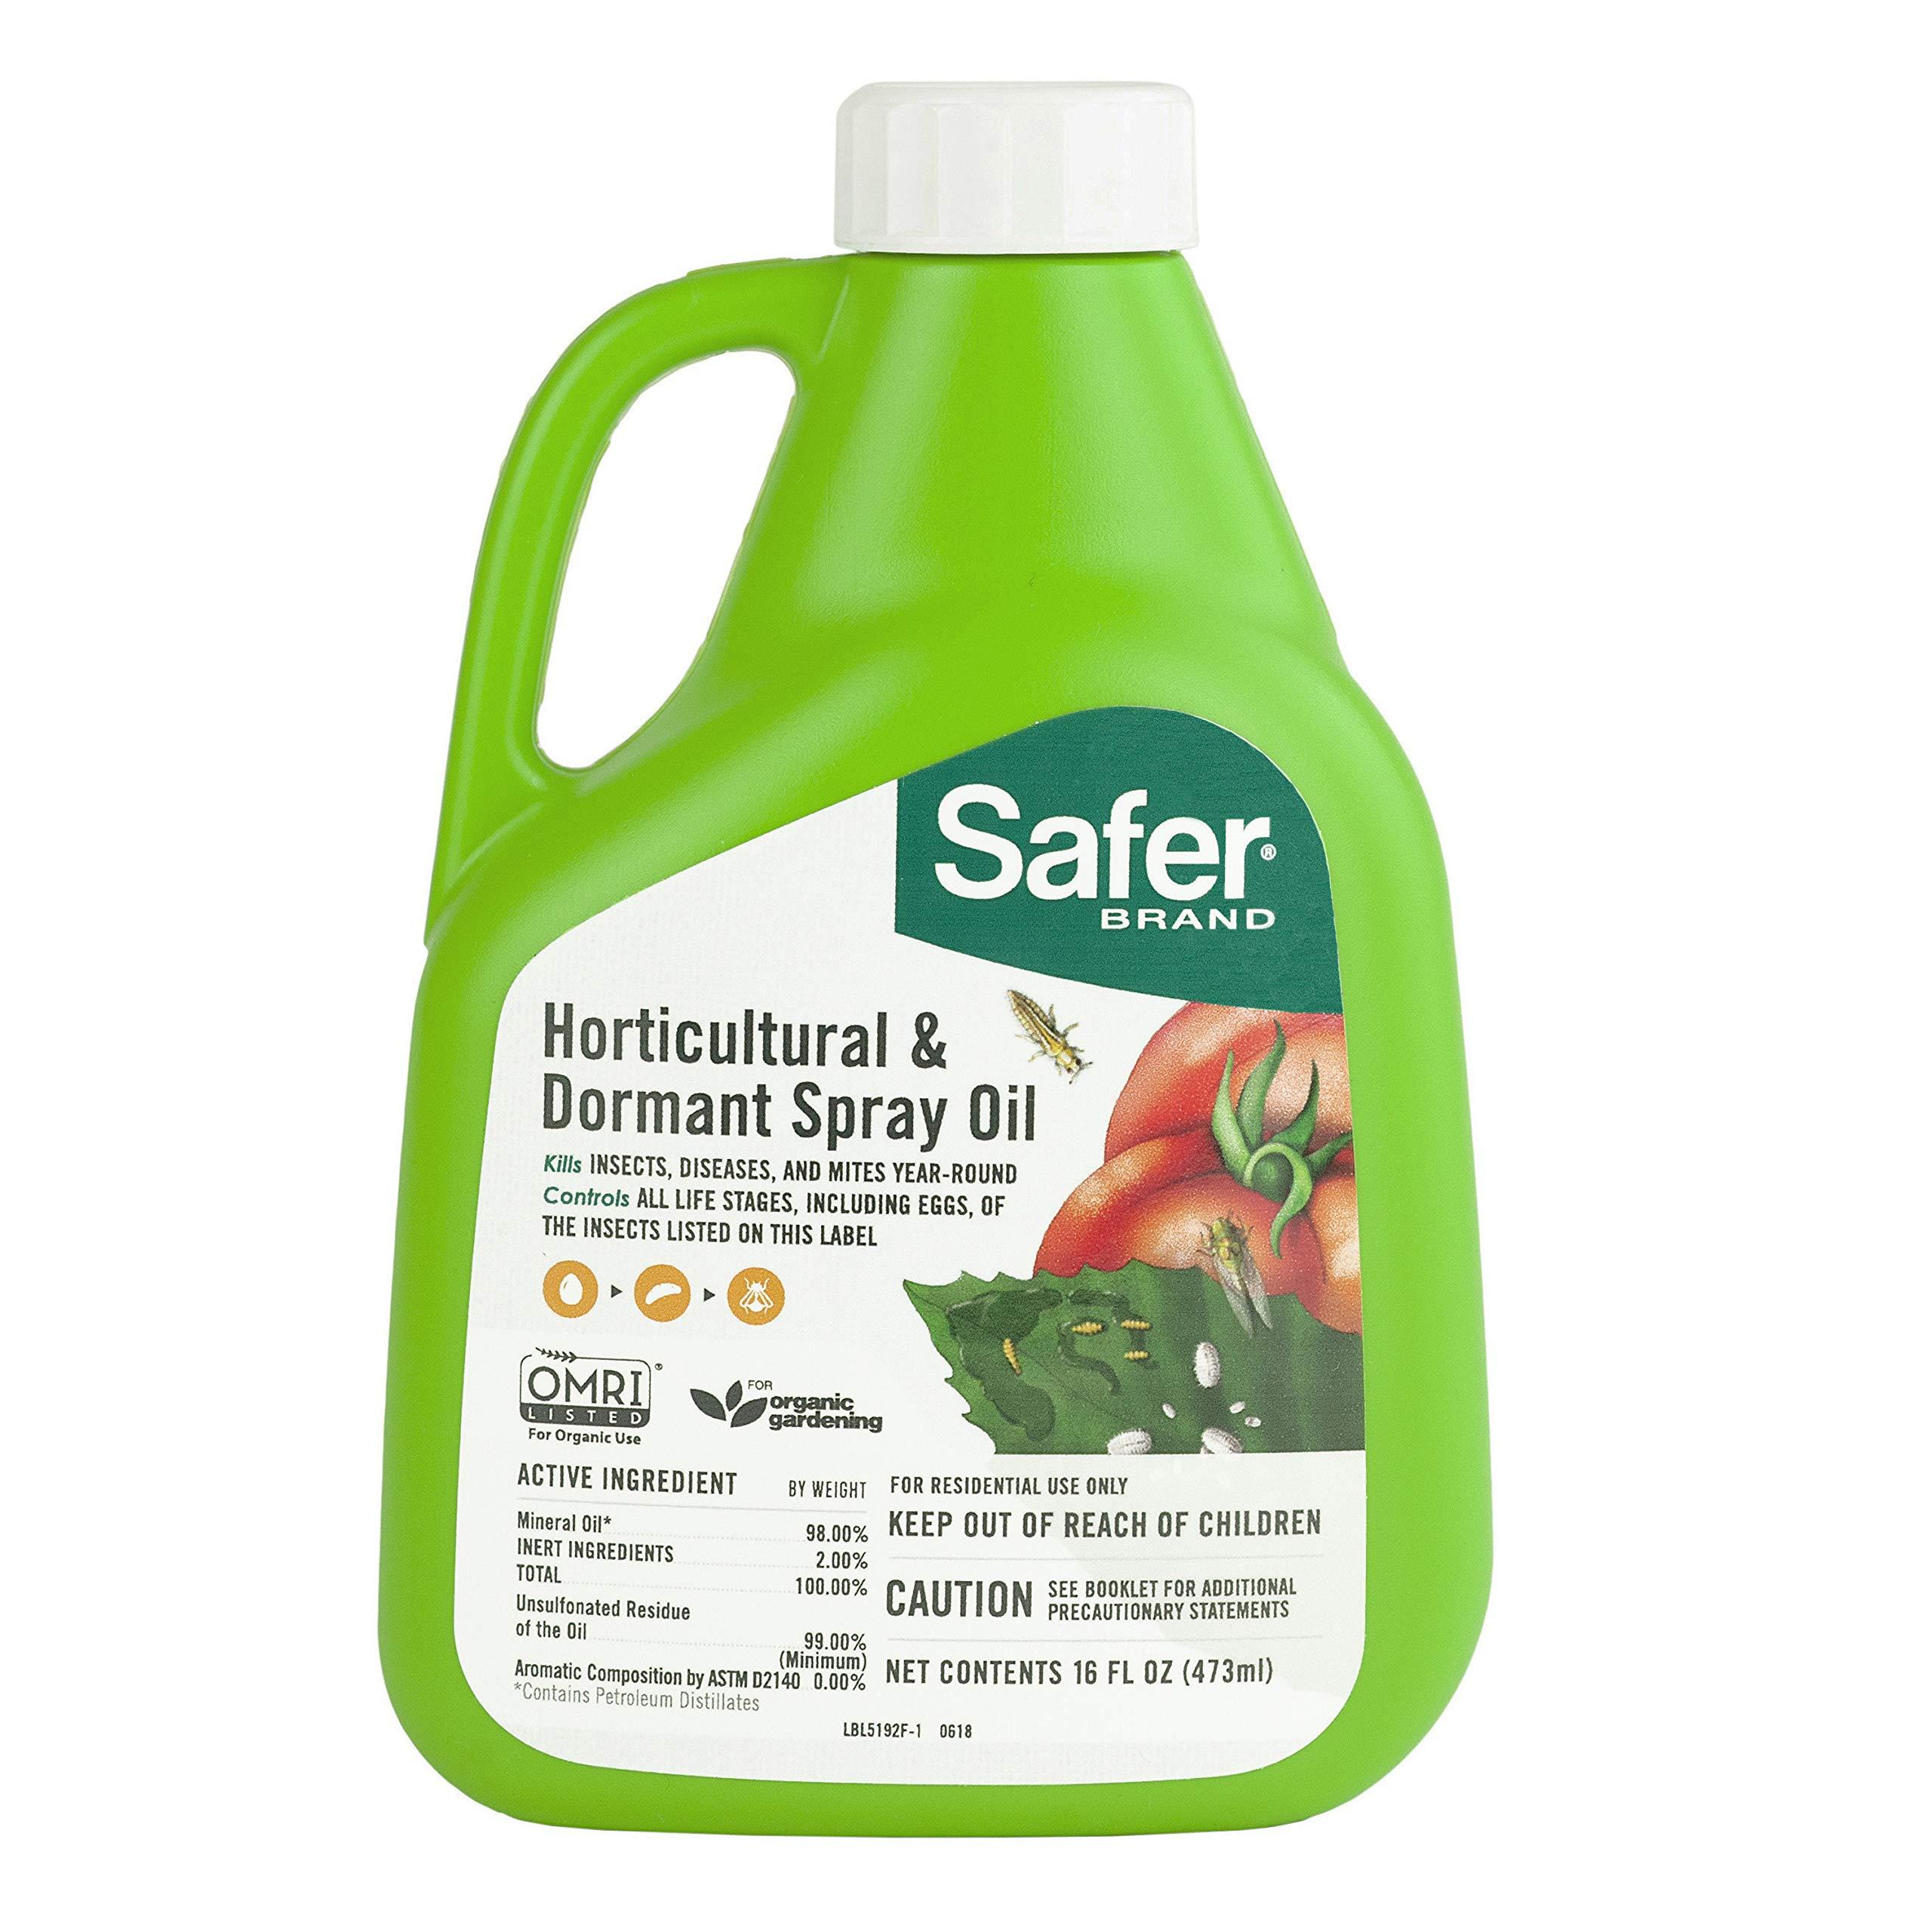 Safer 5192-6 Brand 16 oz Horticultural & Dormant Spray Oil Concentrate, Green by Safer Brand